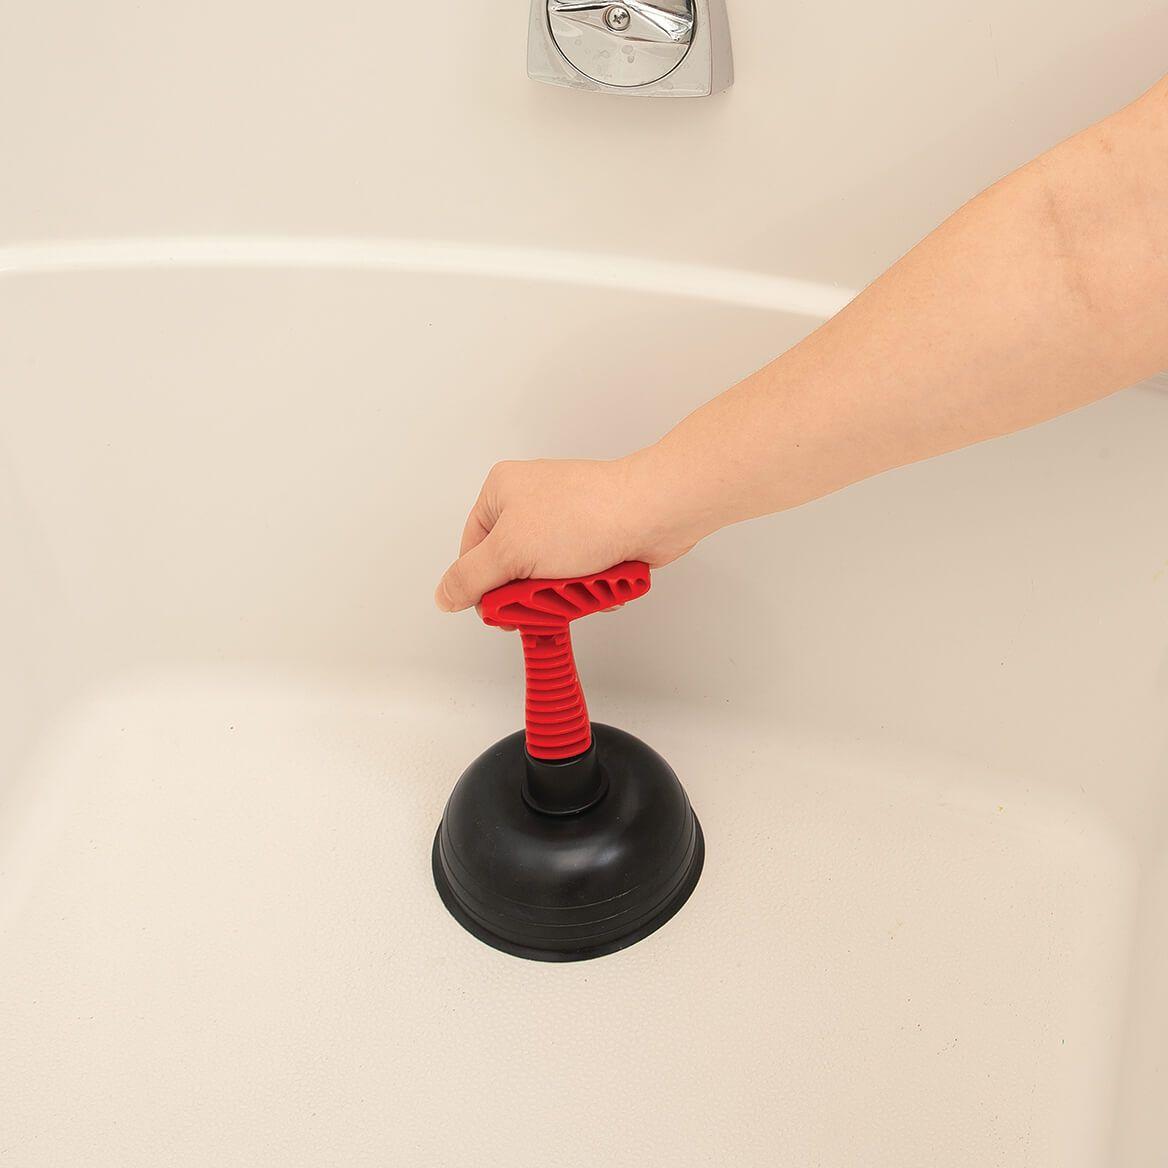 Handheld Sink Drain Plunger, Assorted-372424